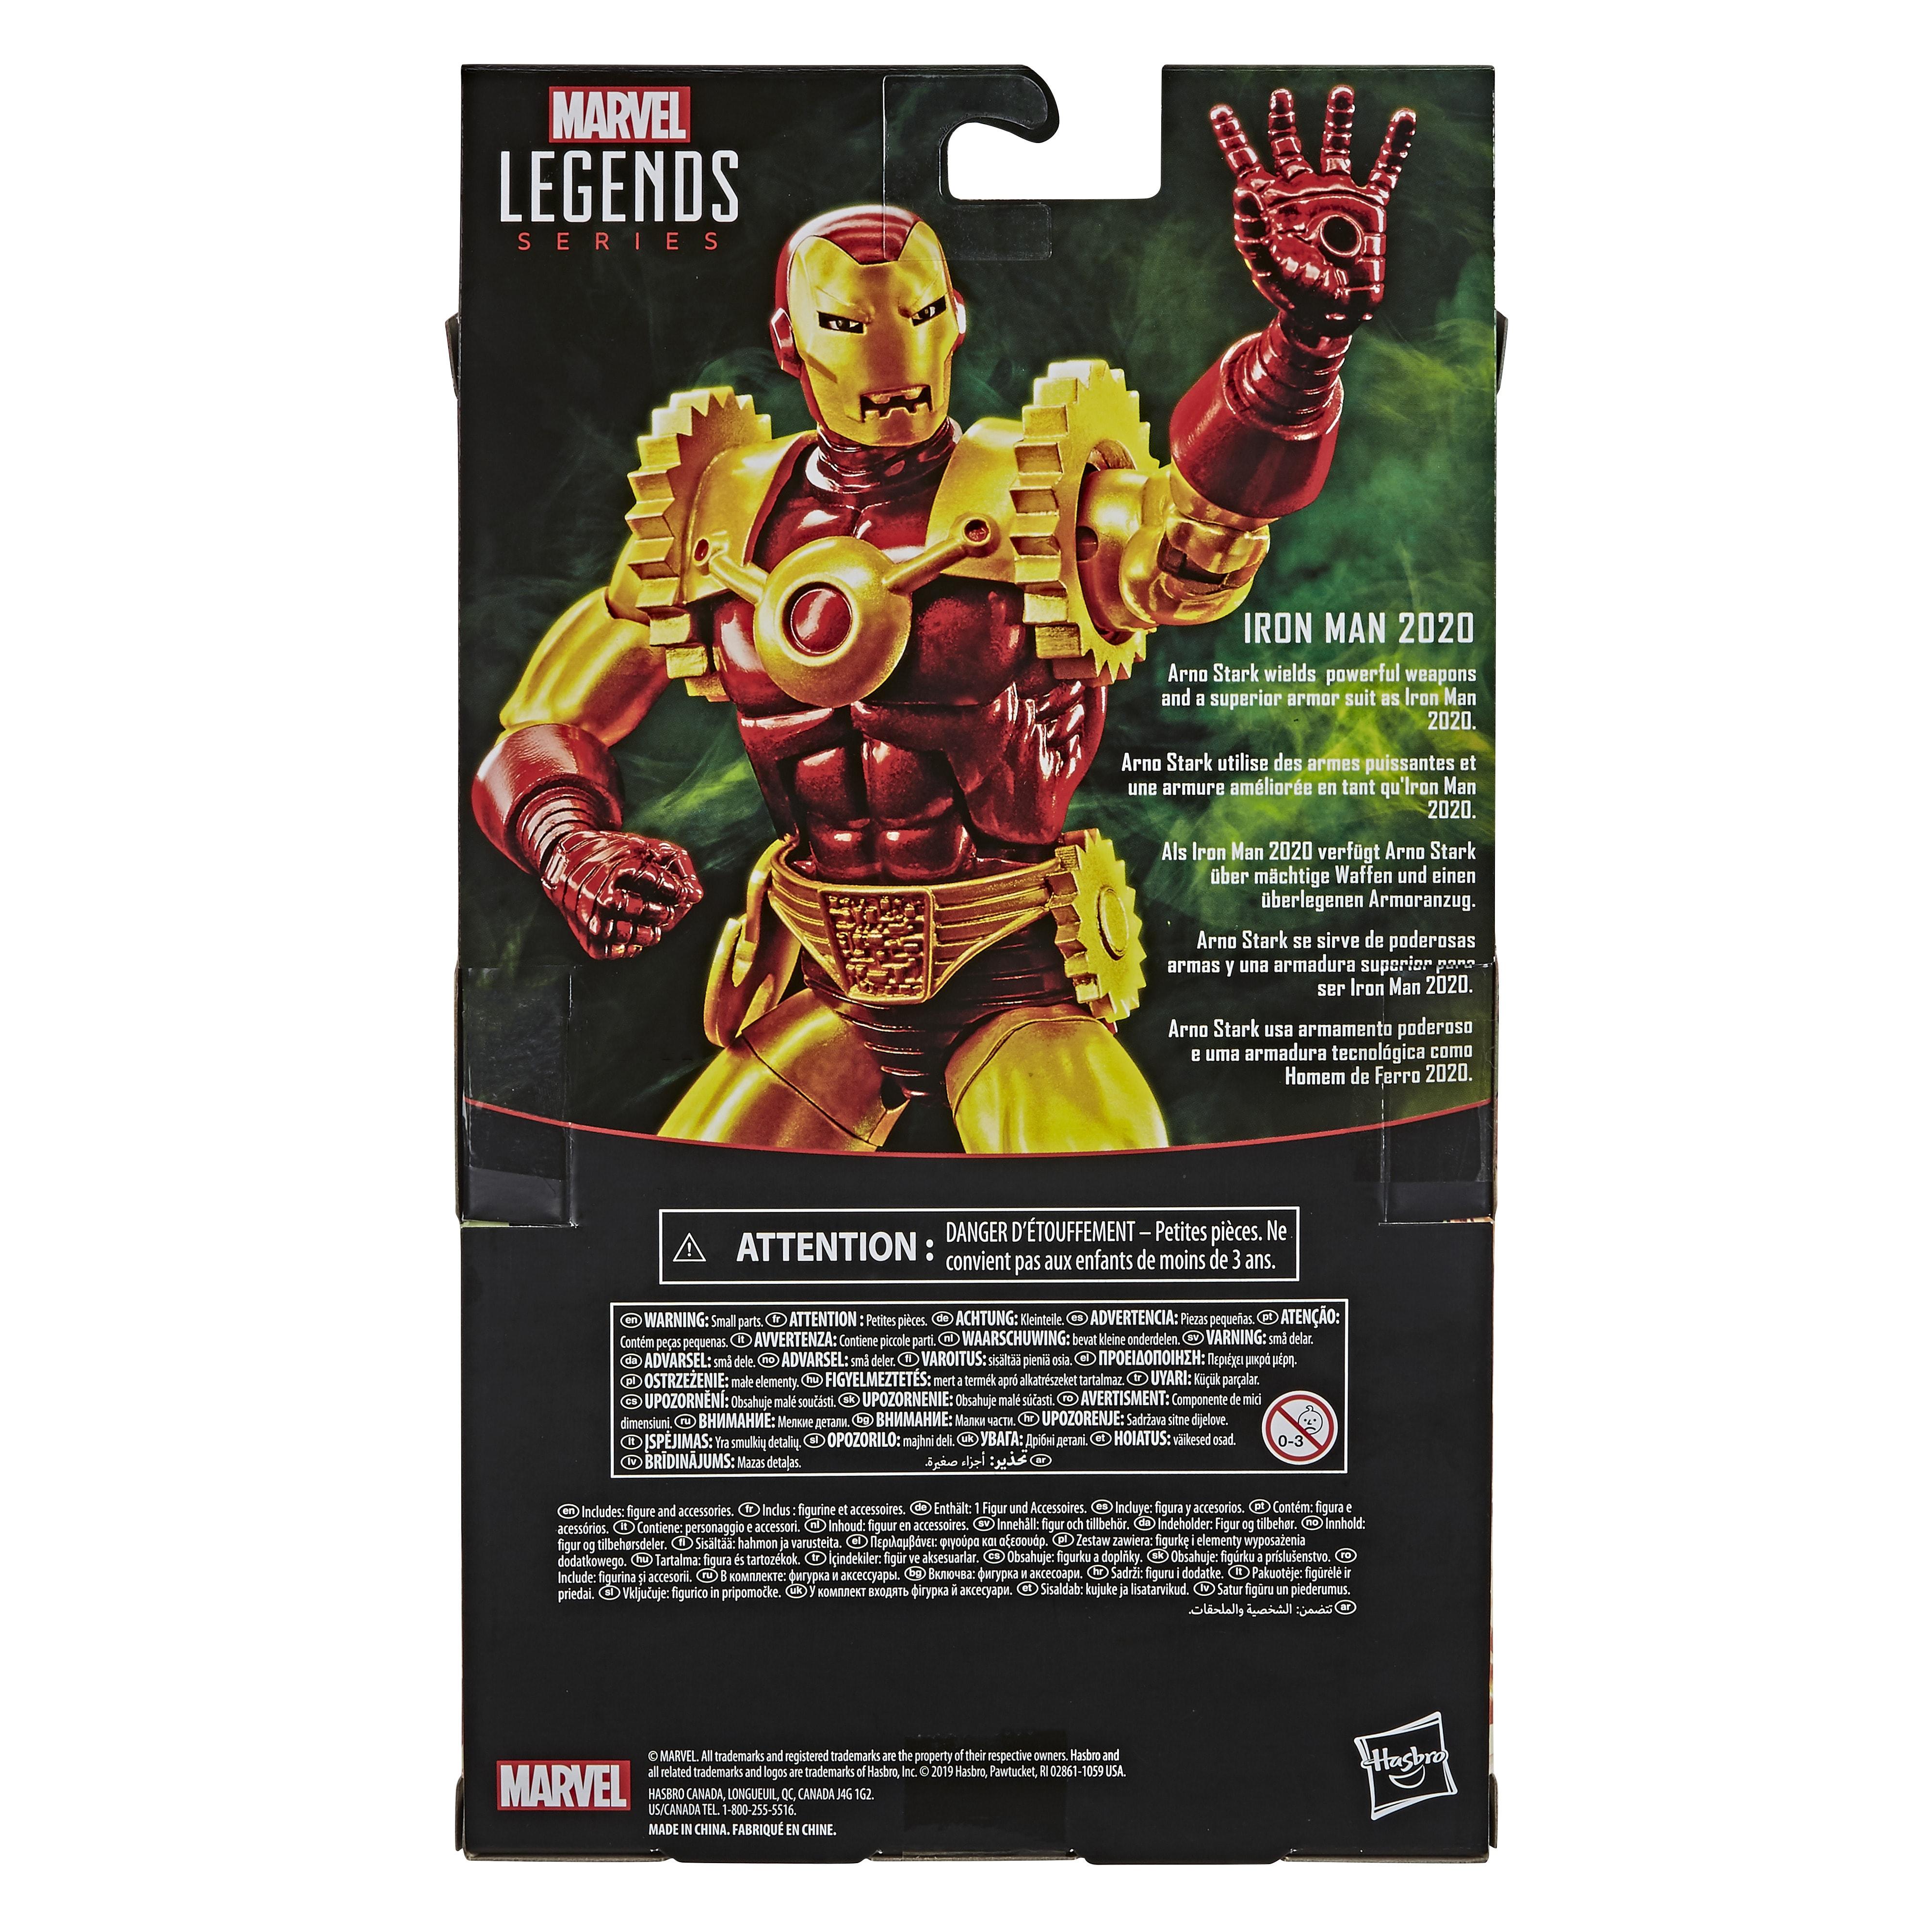 E87085L00 Marvel Legends Iron Man 2020 main back of pack